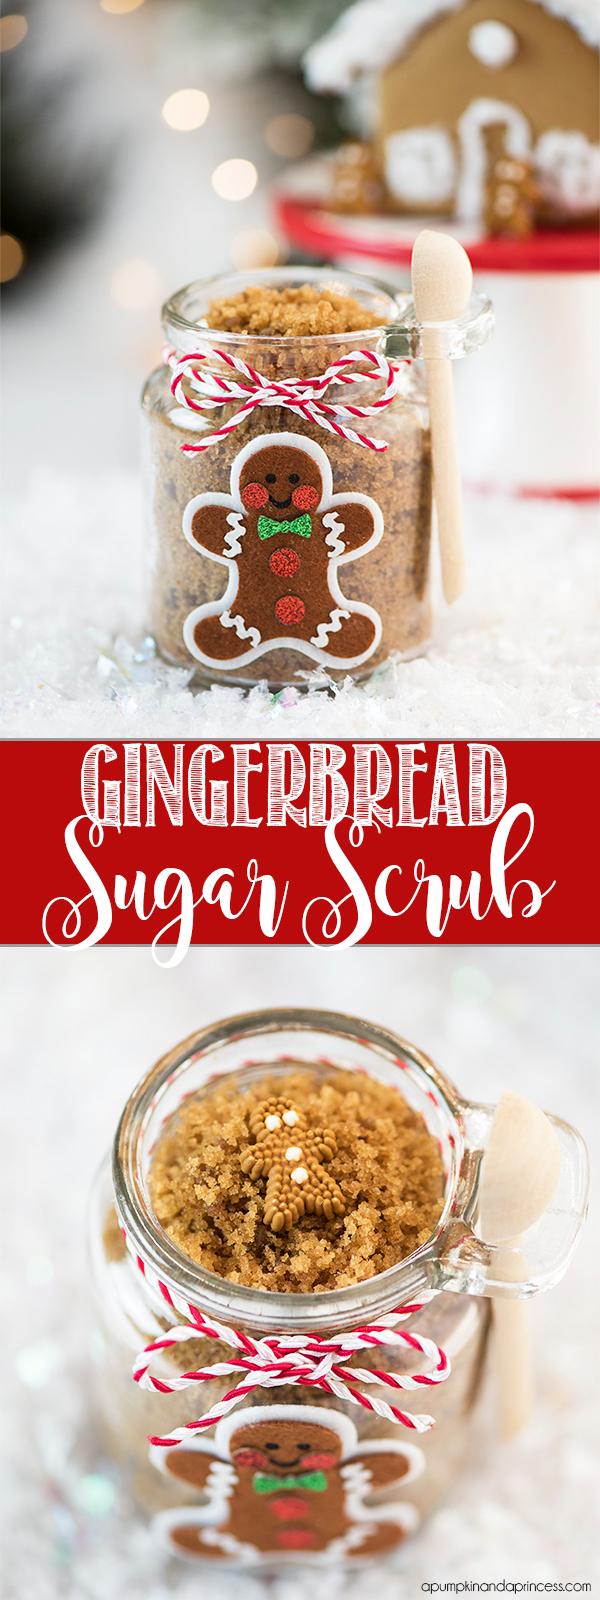 DIY Gingerbread Sugar Scrub – this easy gingerbread sugar scrub smells amazing and makes a lovely handmade gift idea!